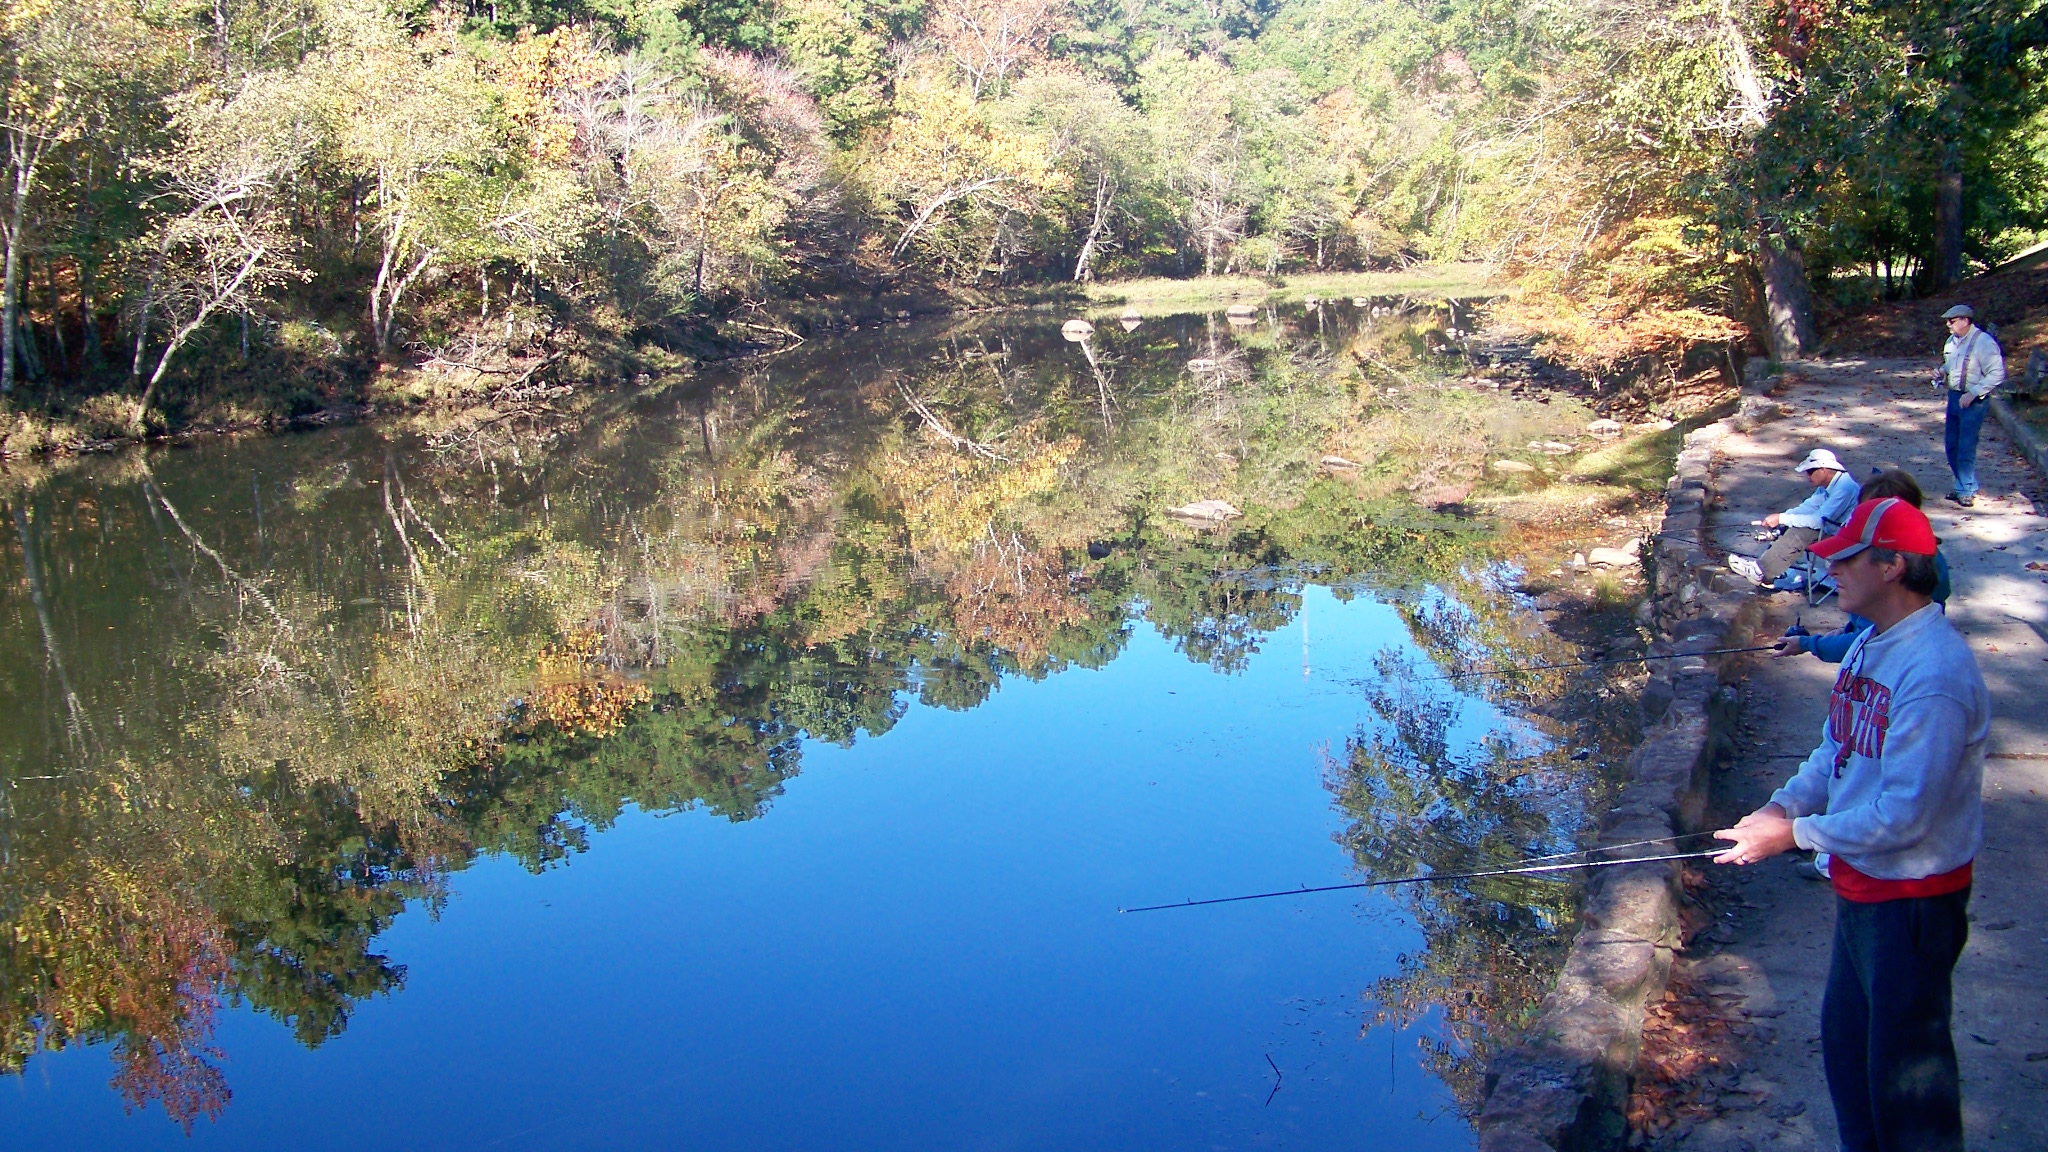 Fly fishing on the Little Missouri